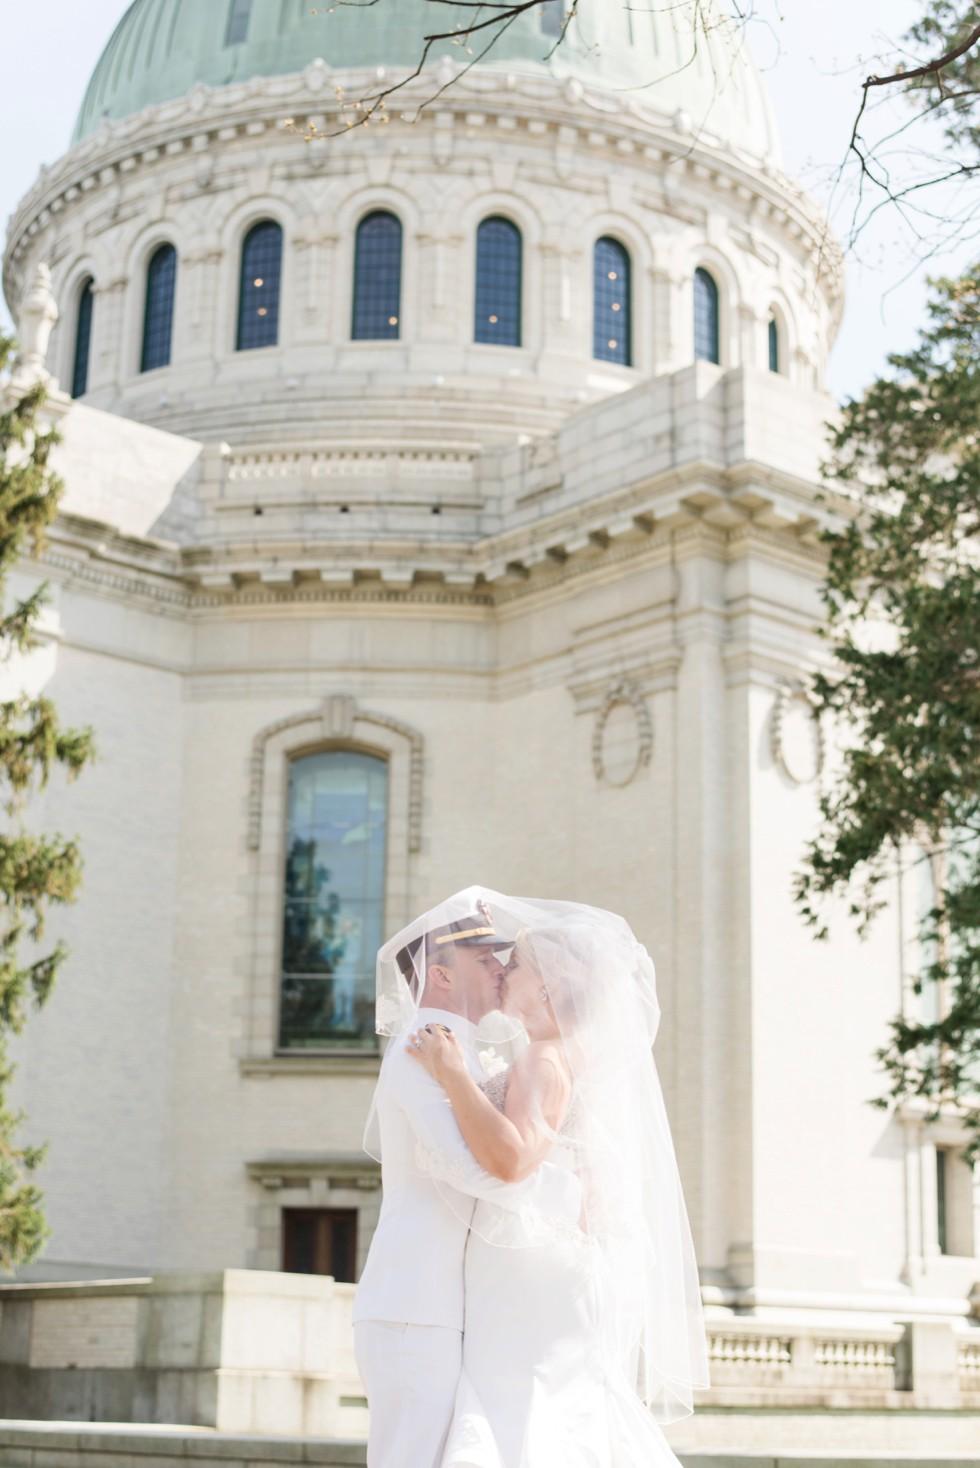 US Naval Academy Bride and Groom